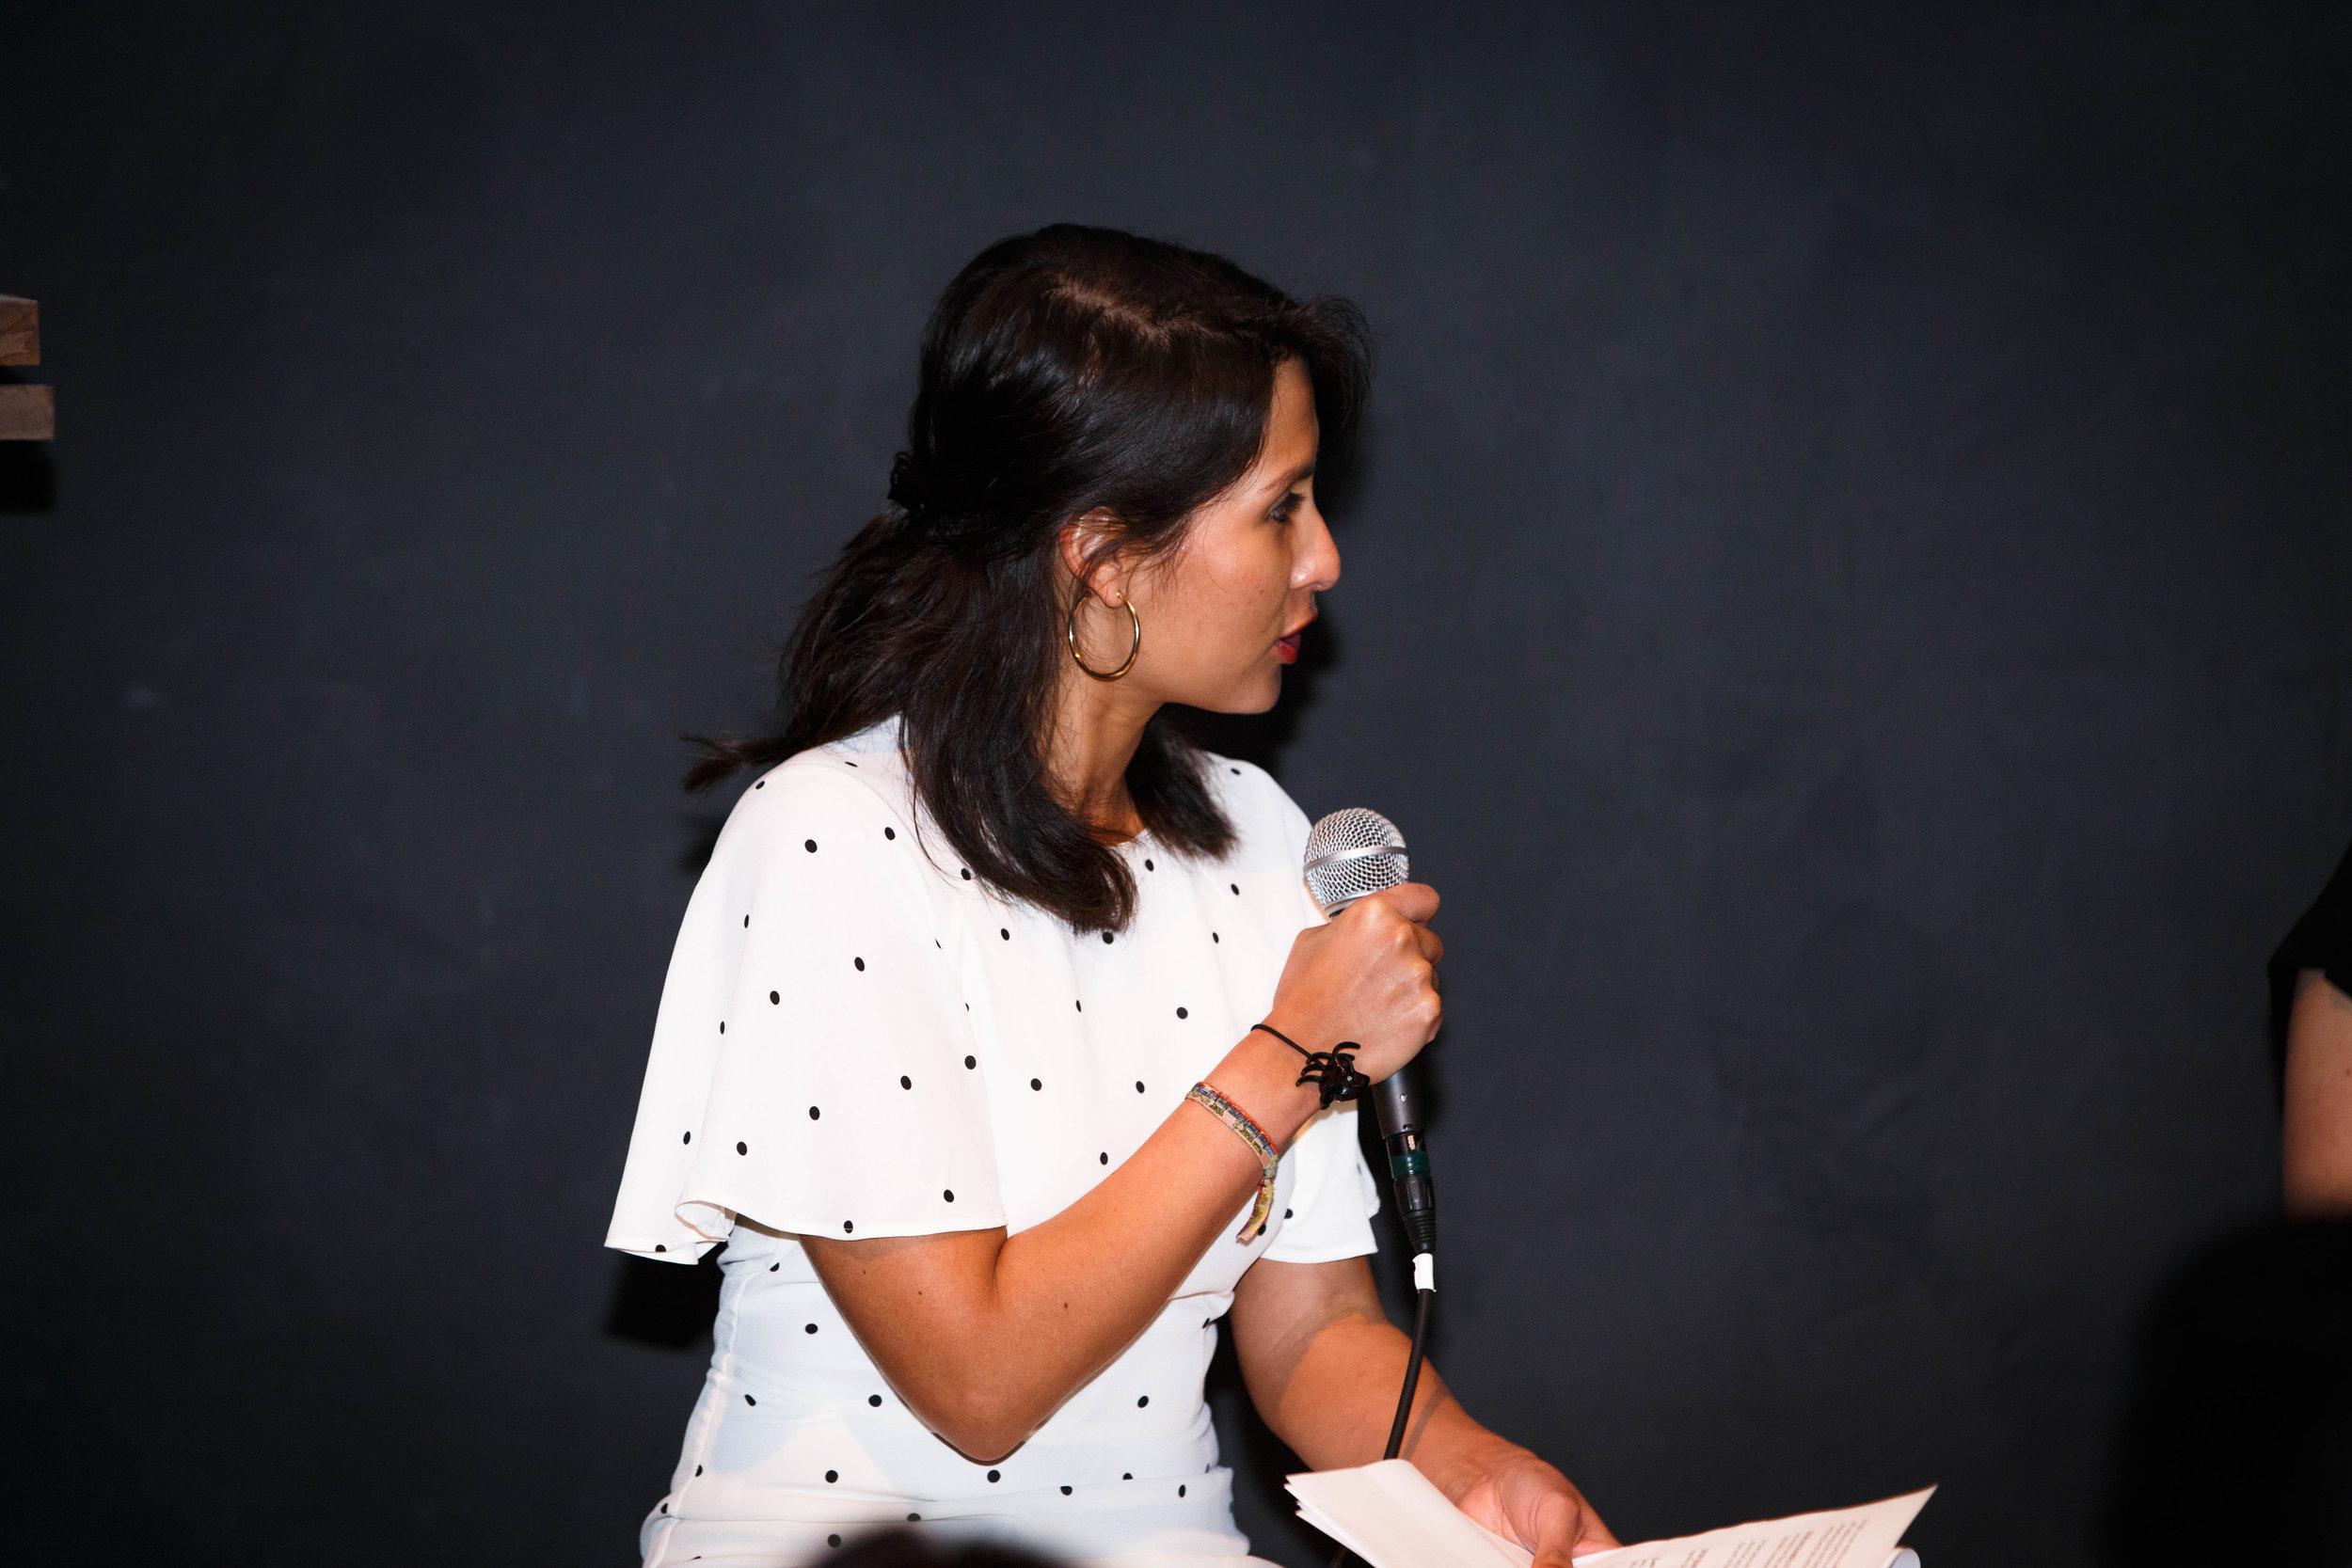 Cynthia Villamizar (Cyntivee)